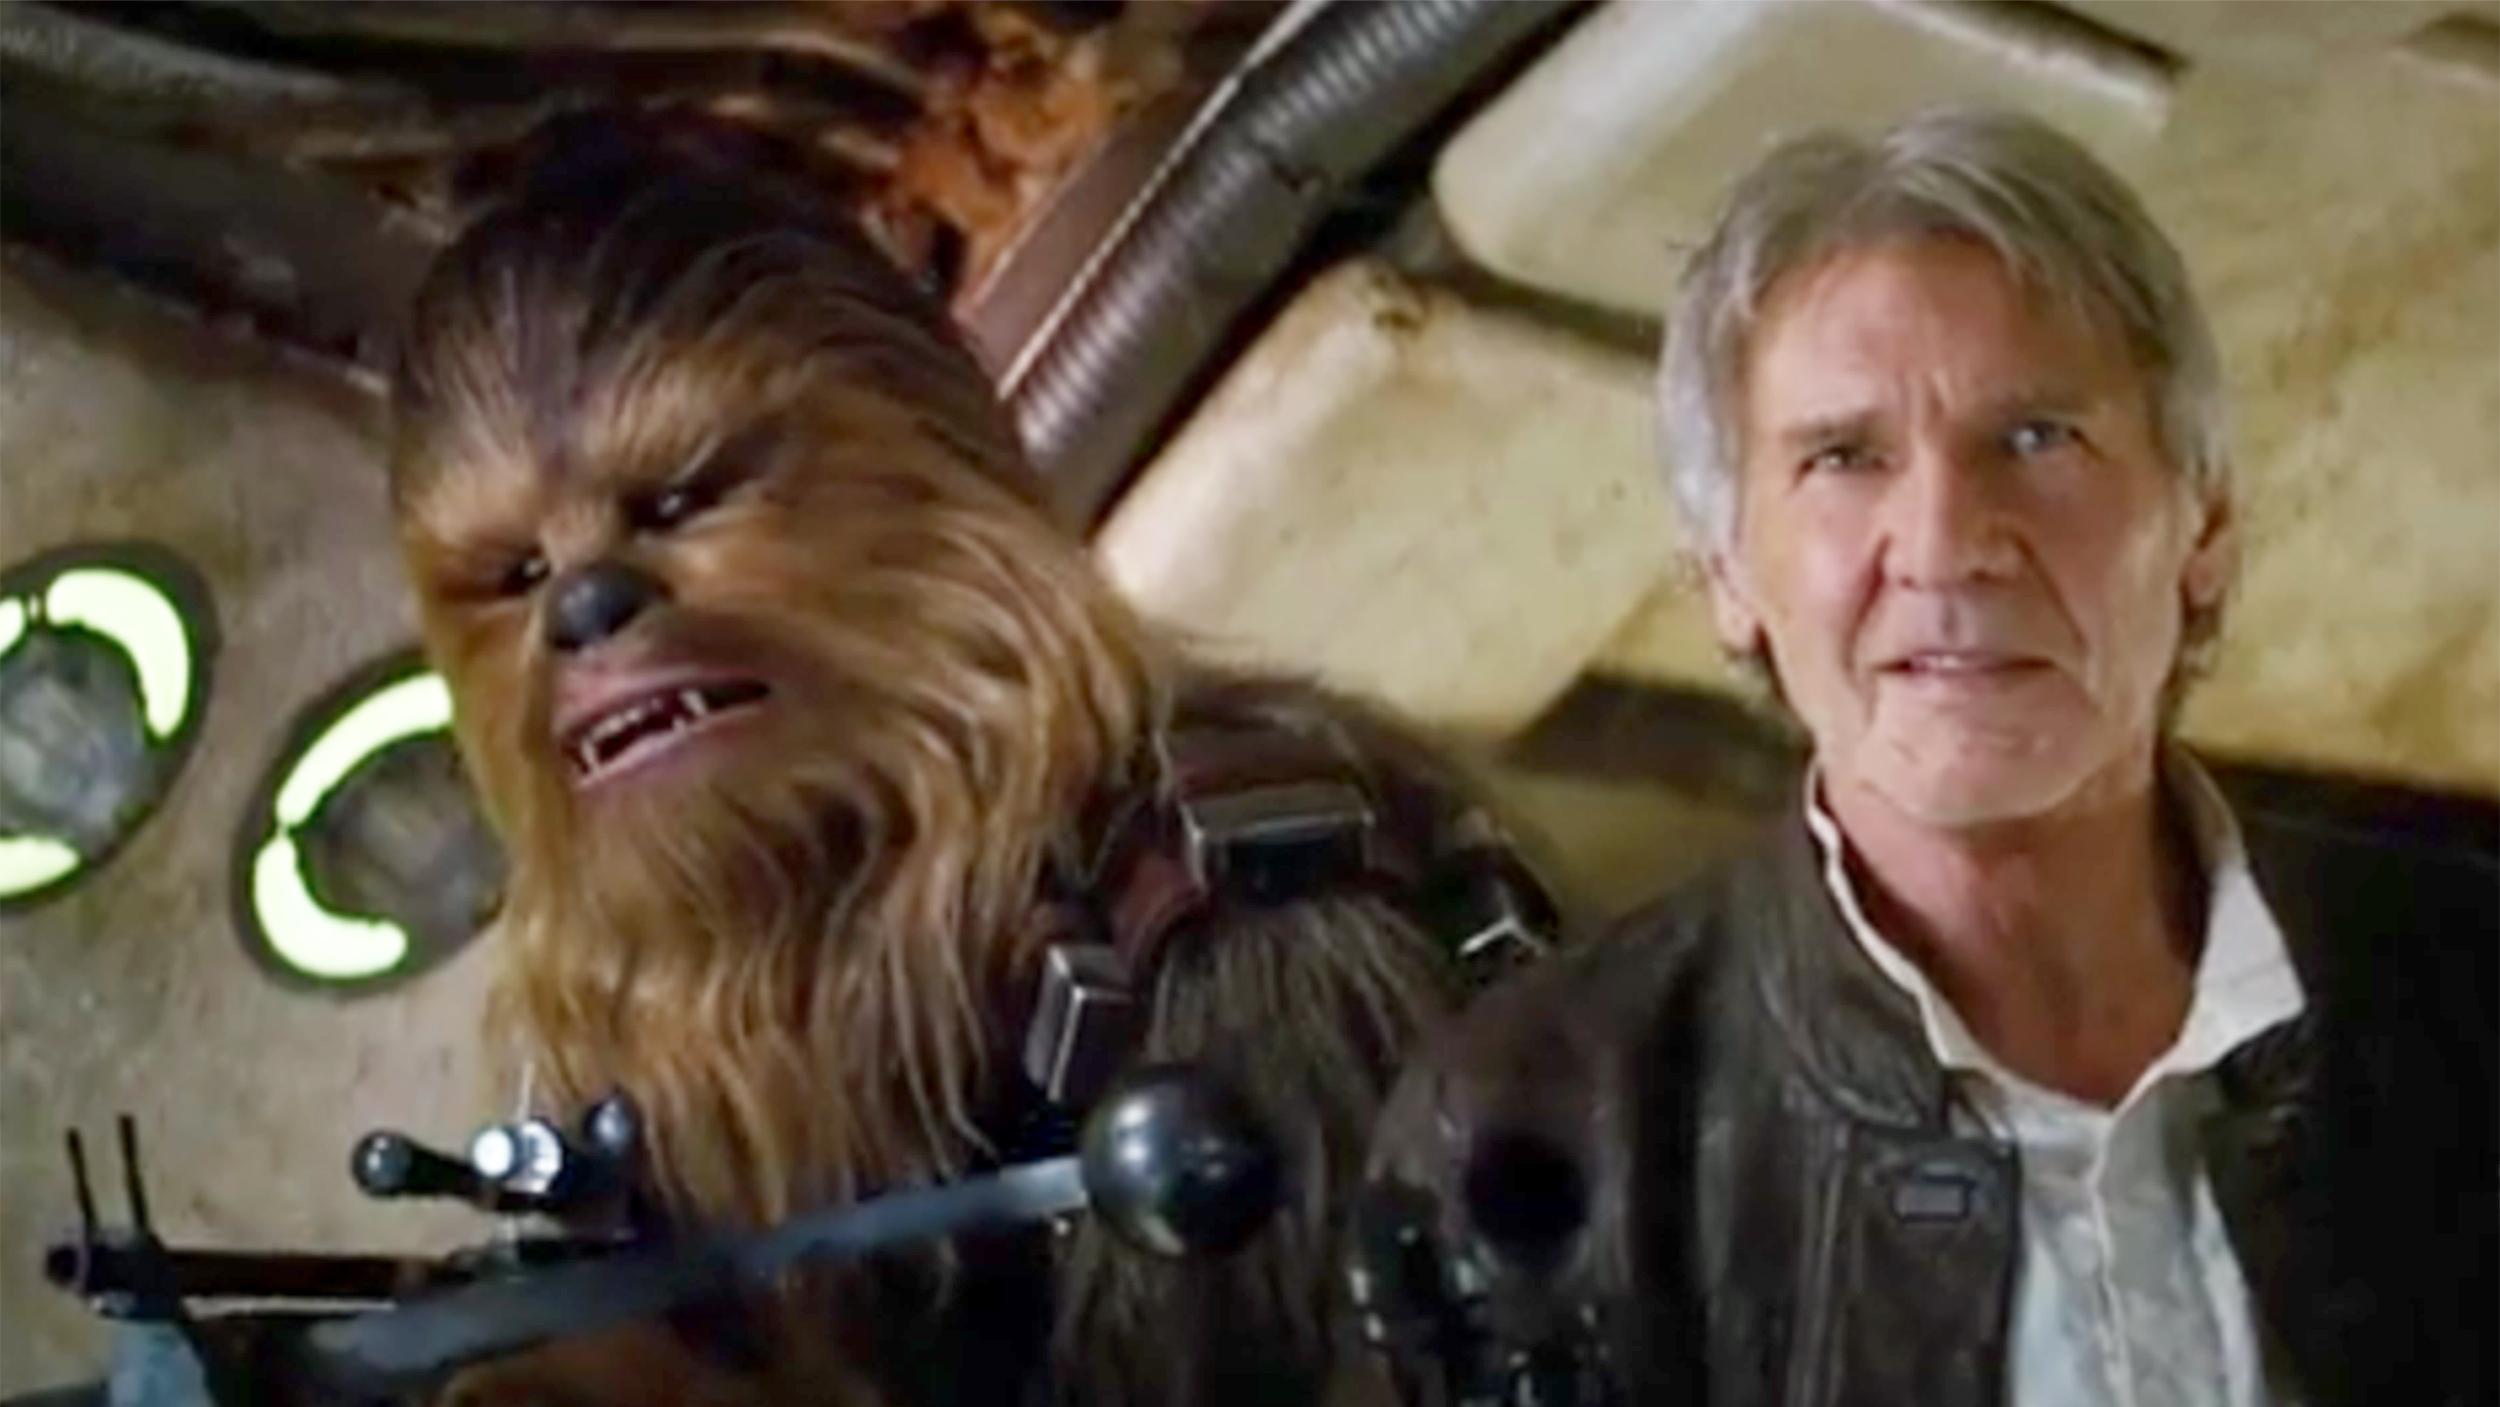 Star Wars: The Force Awakens Official Teaser #2